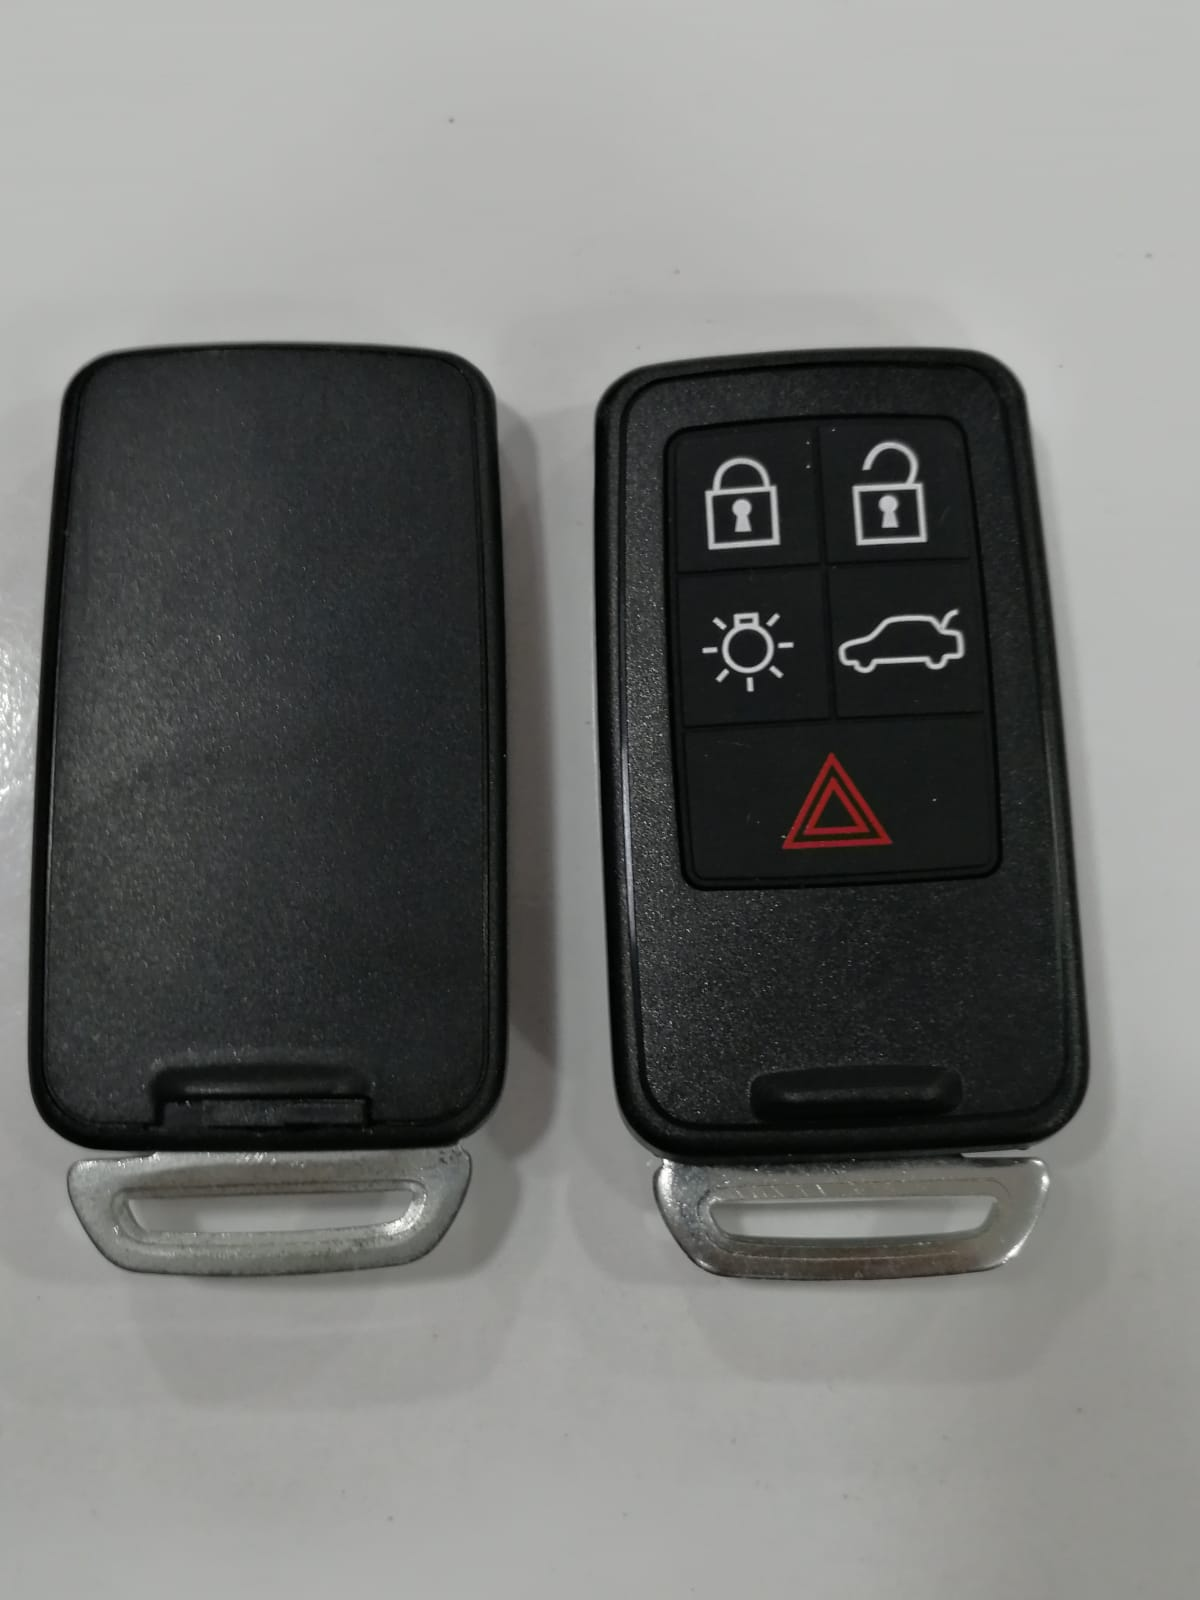 Volvo Smart 5 buton